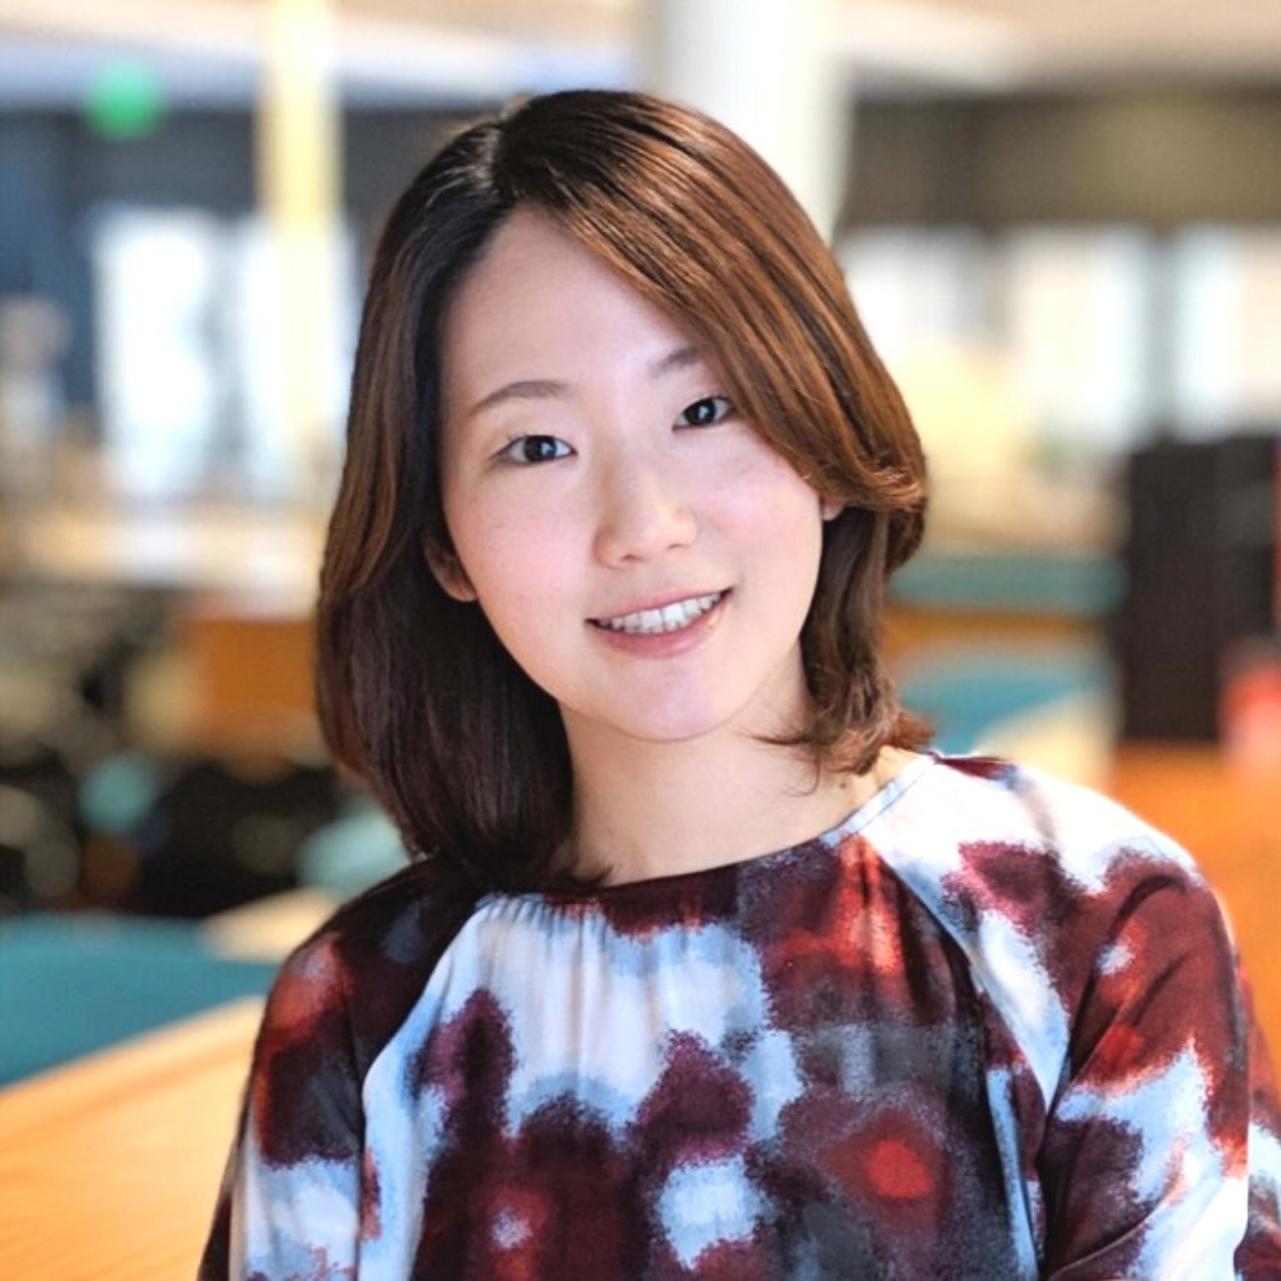 Alyssa Min Co-Founder of Seknd Interview